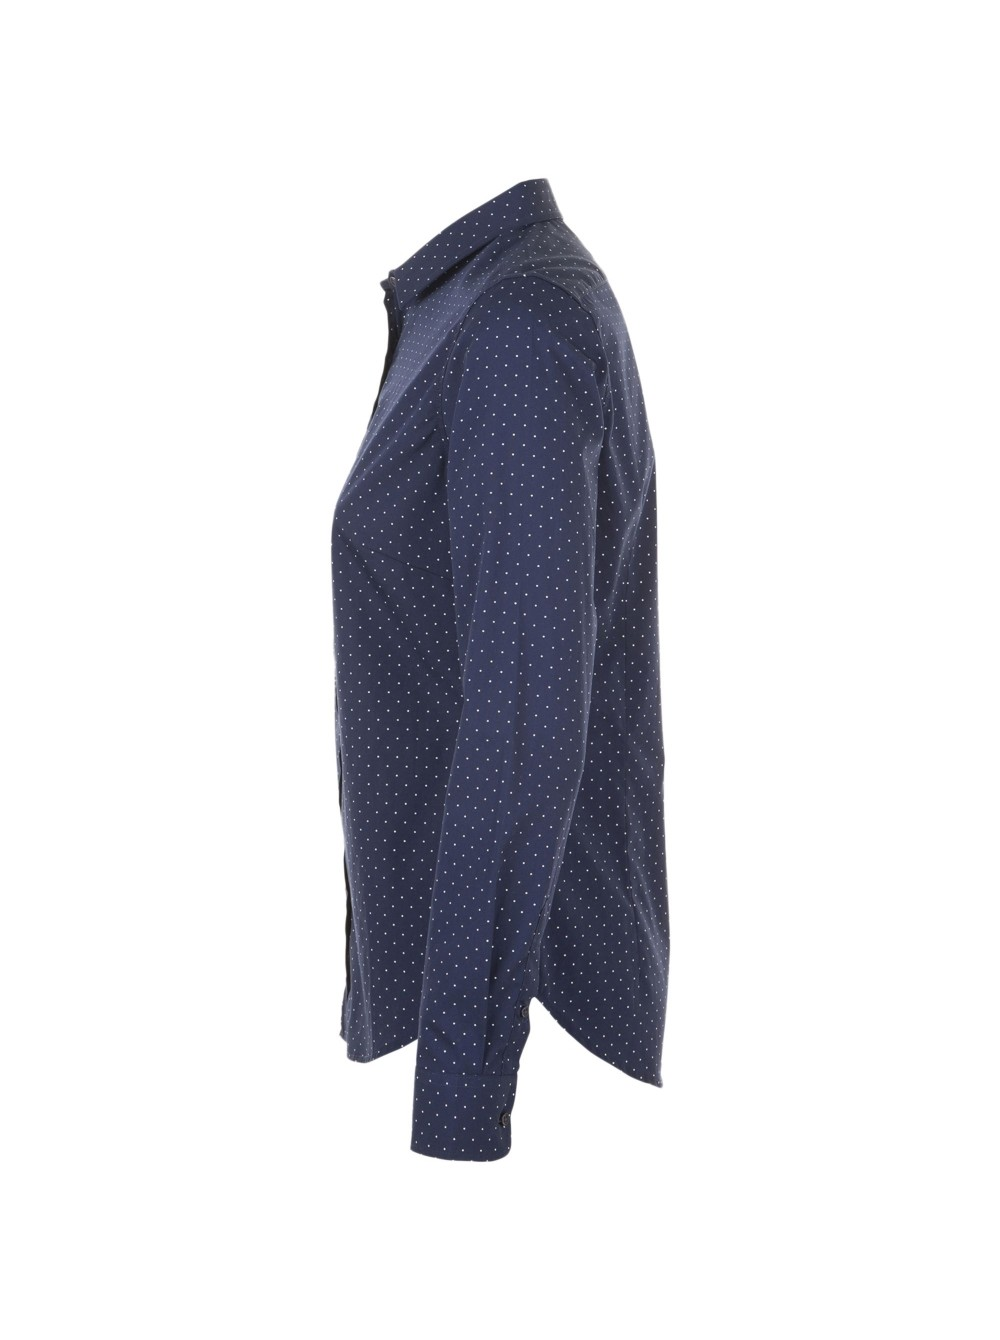 ddb6f53fdd47 Рубашка женская BECKER WOMEN, темно-синяя с белым оптом